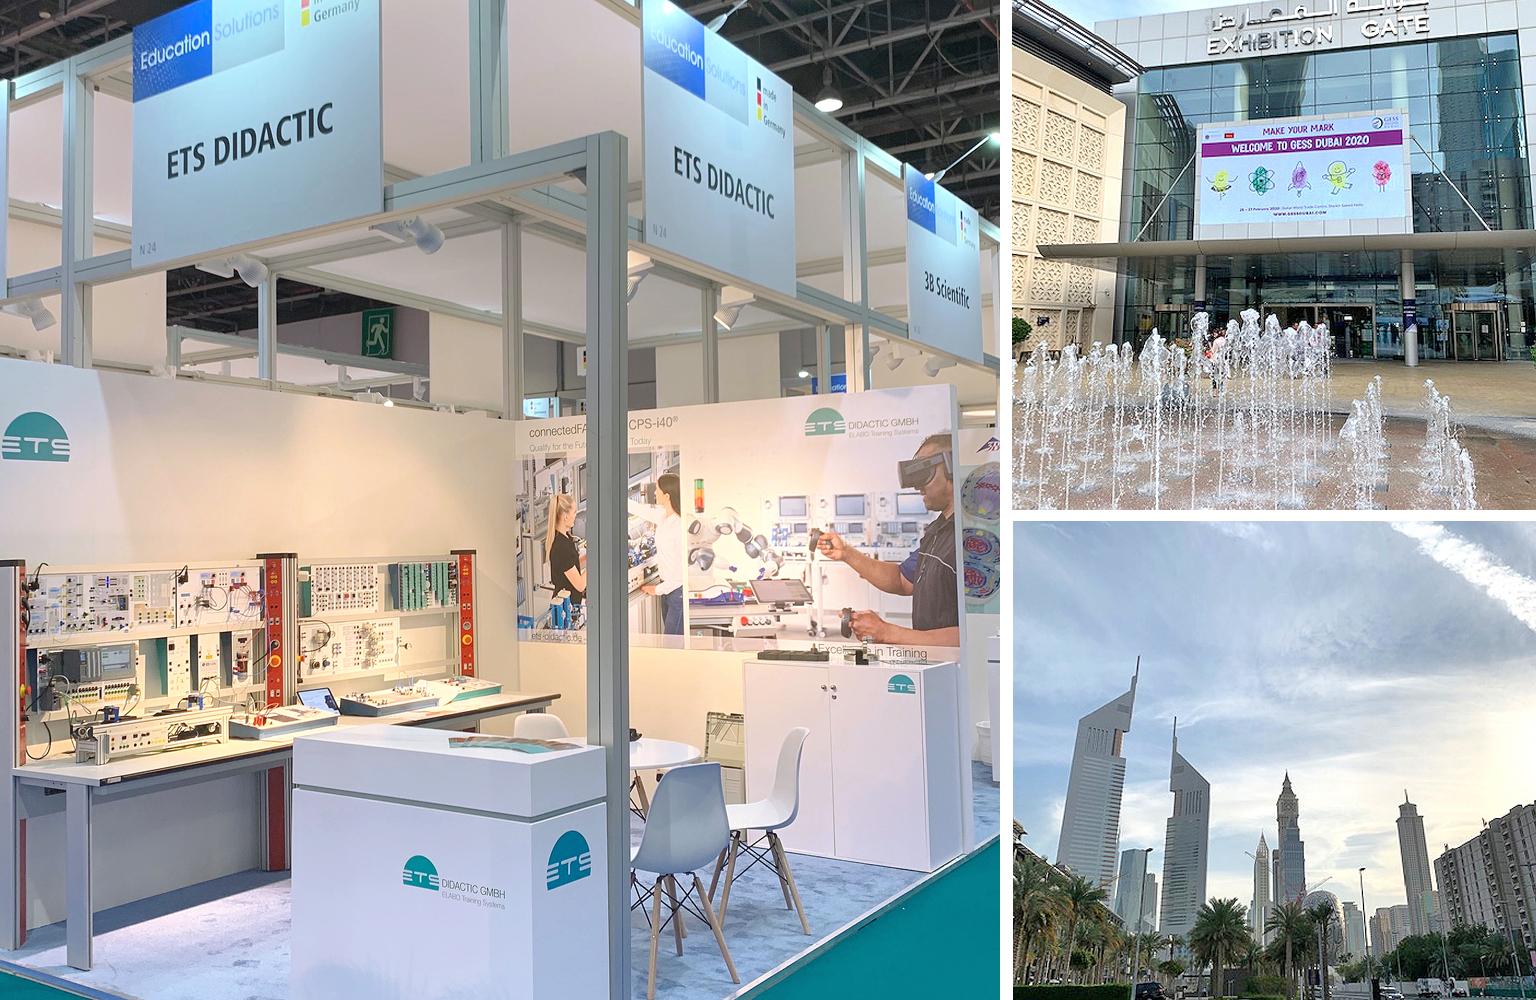 GESS 2020 - Positive fair feedback in Dubai